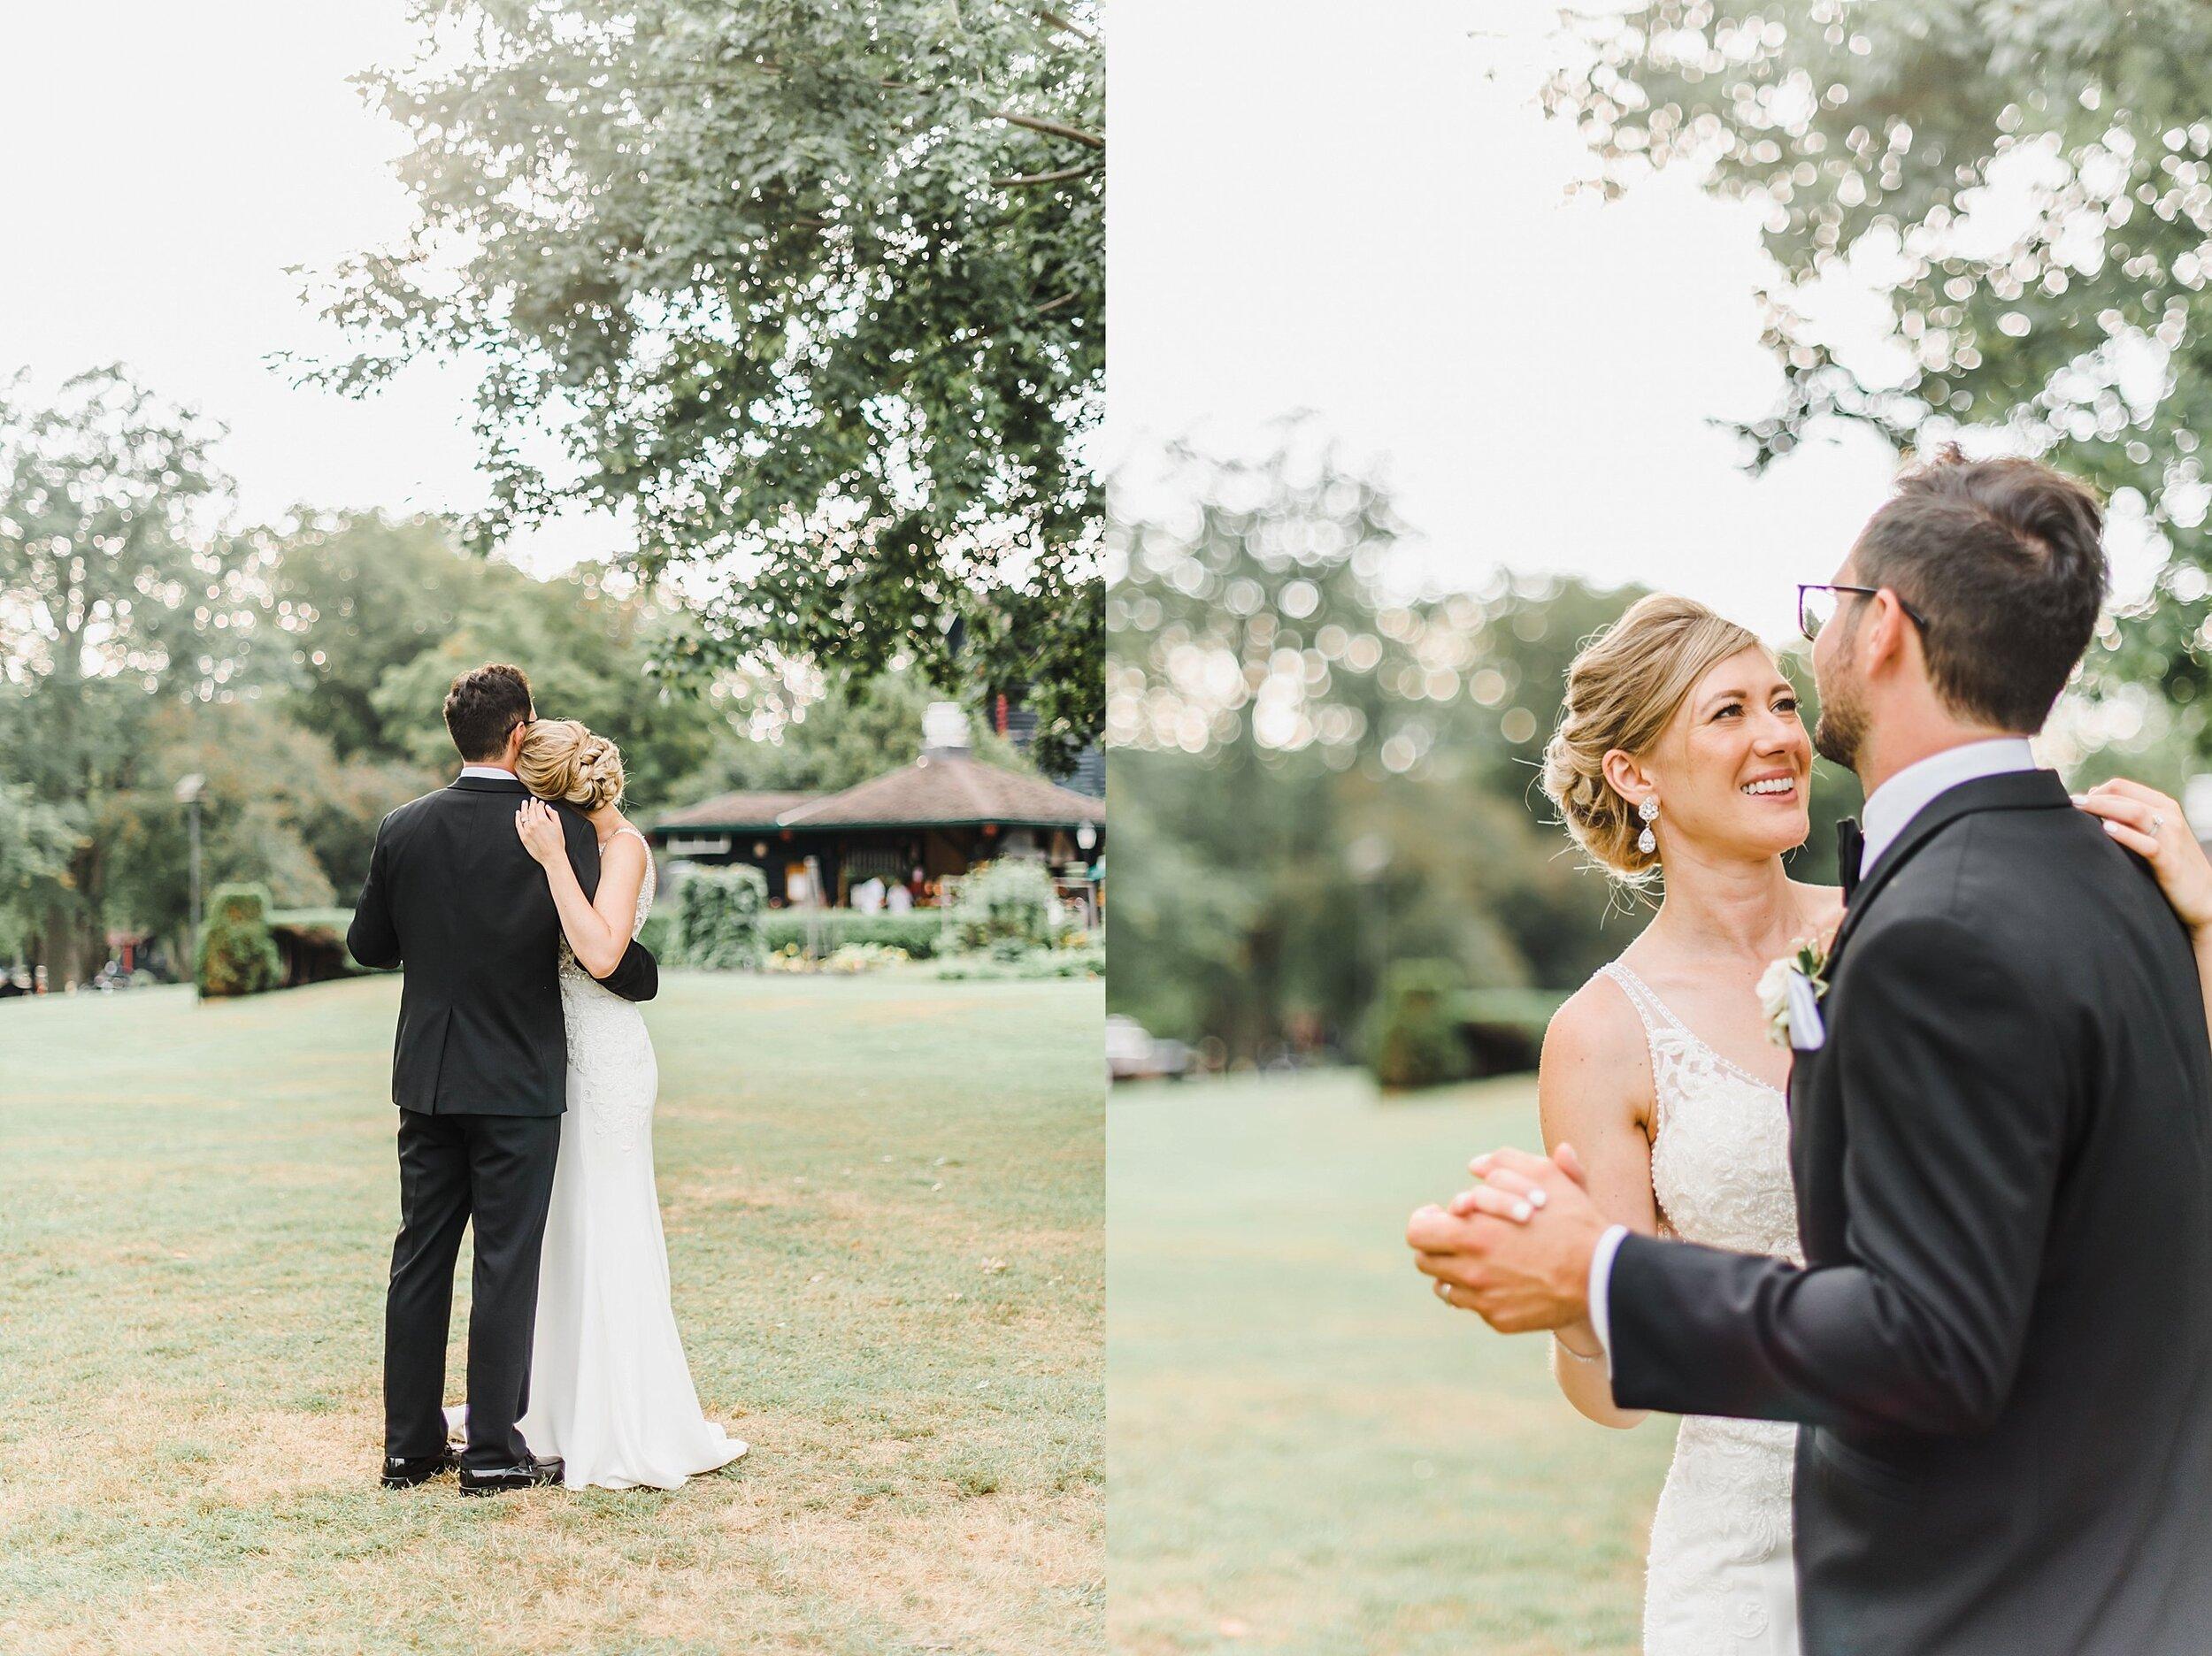 light airy fine art ottawa wedding photographer | Ali and Batoul Photography | Fairmont Le Chateau Montebello66.jpg